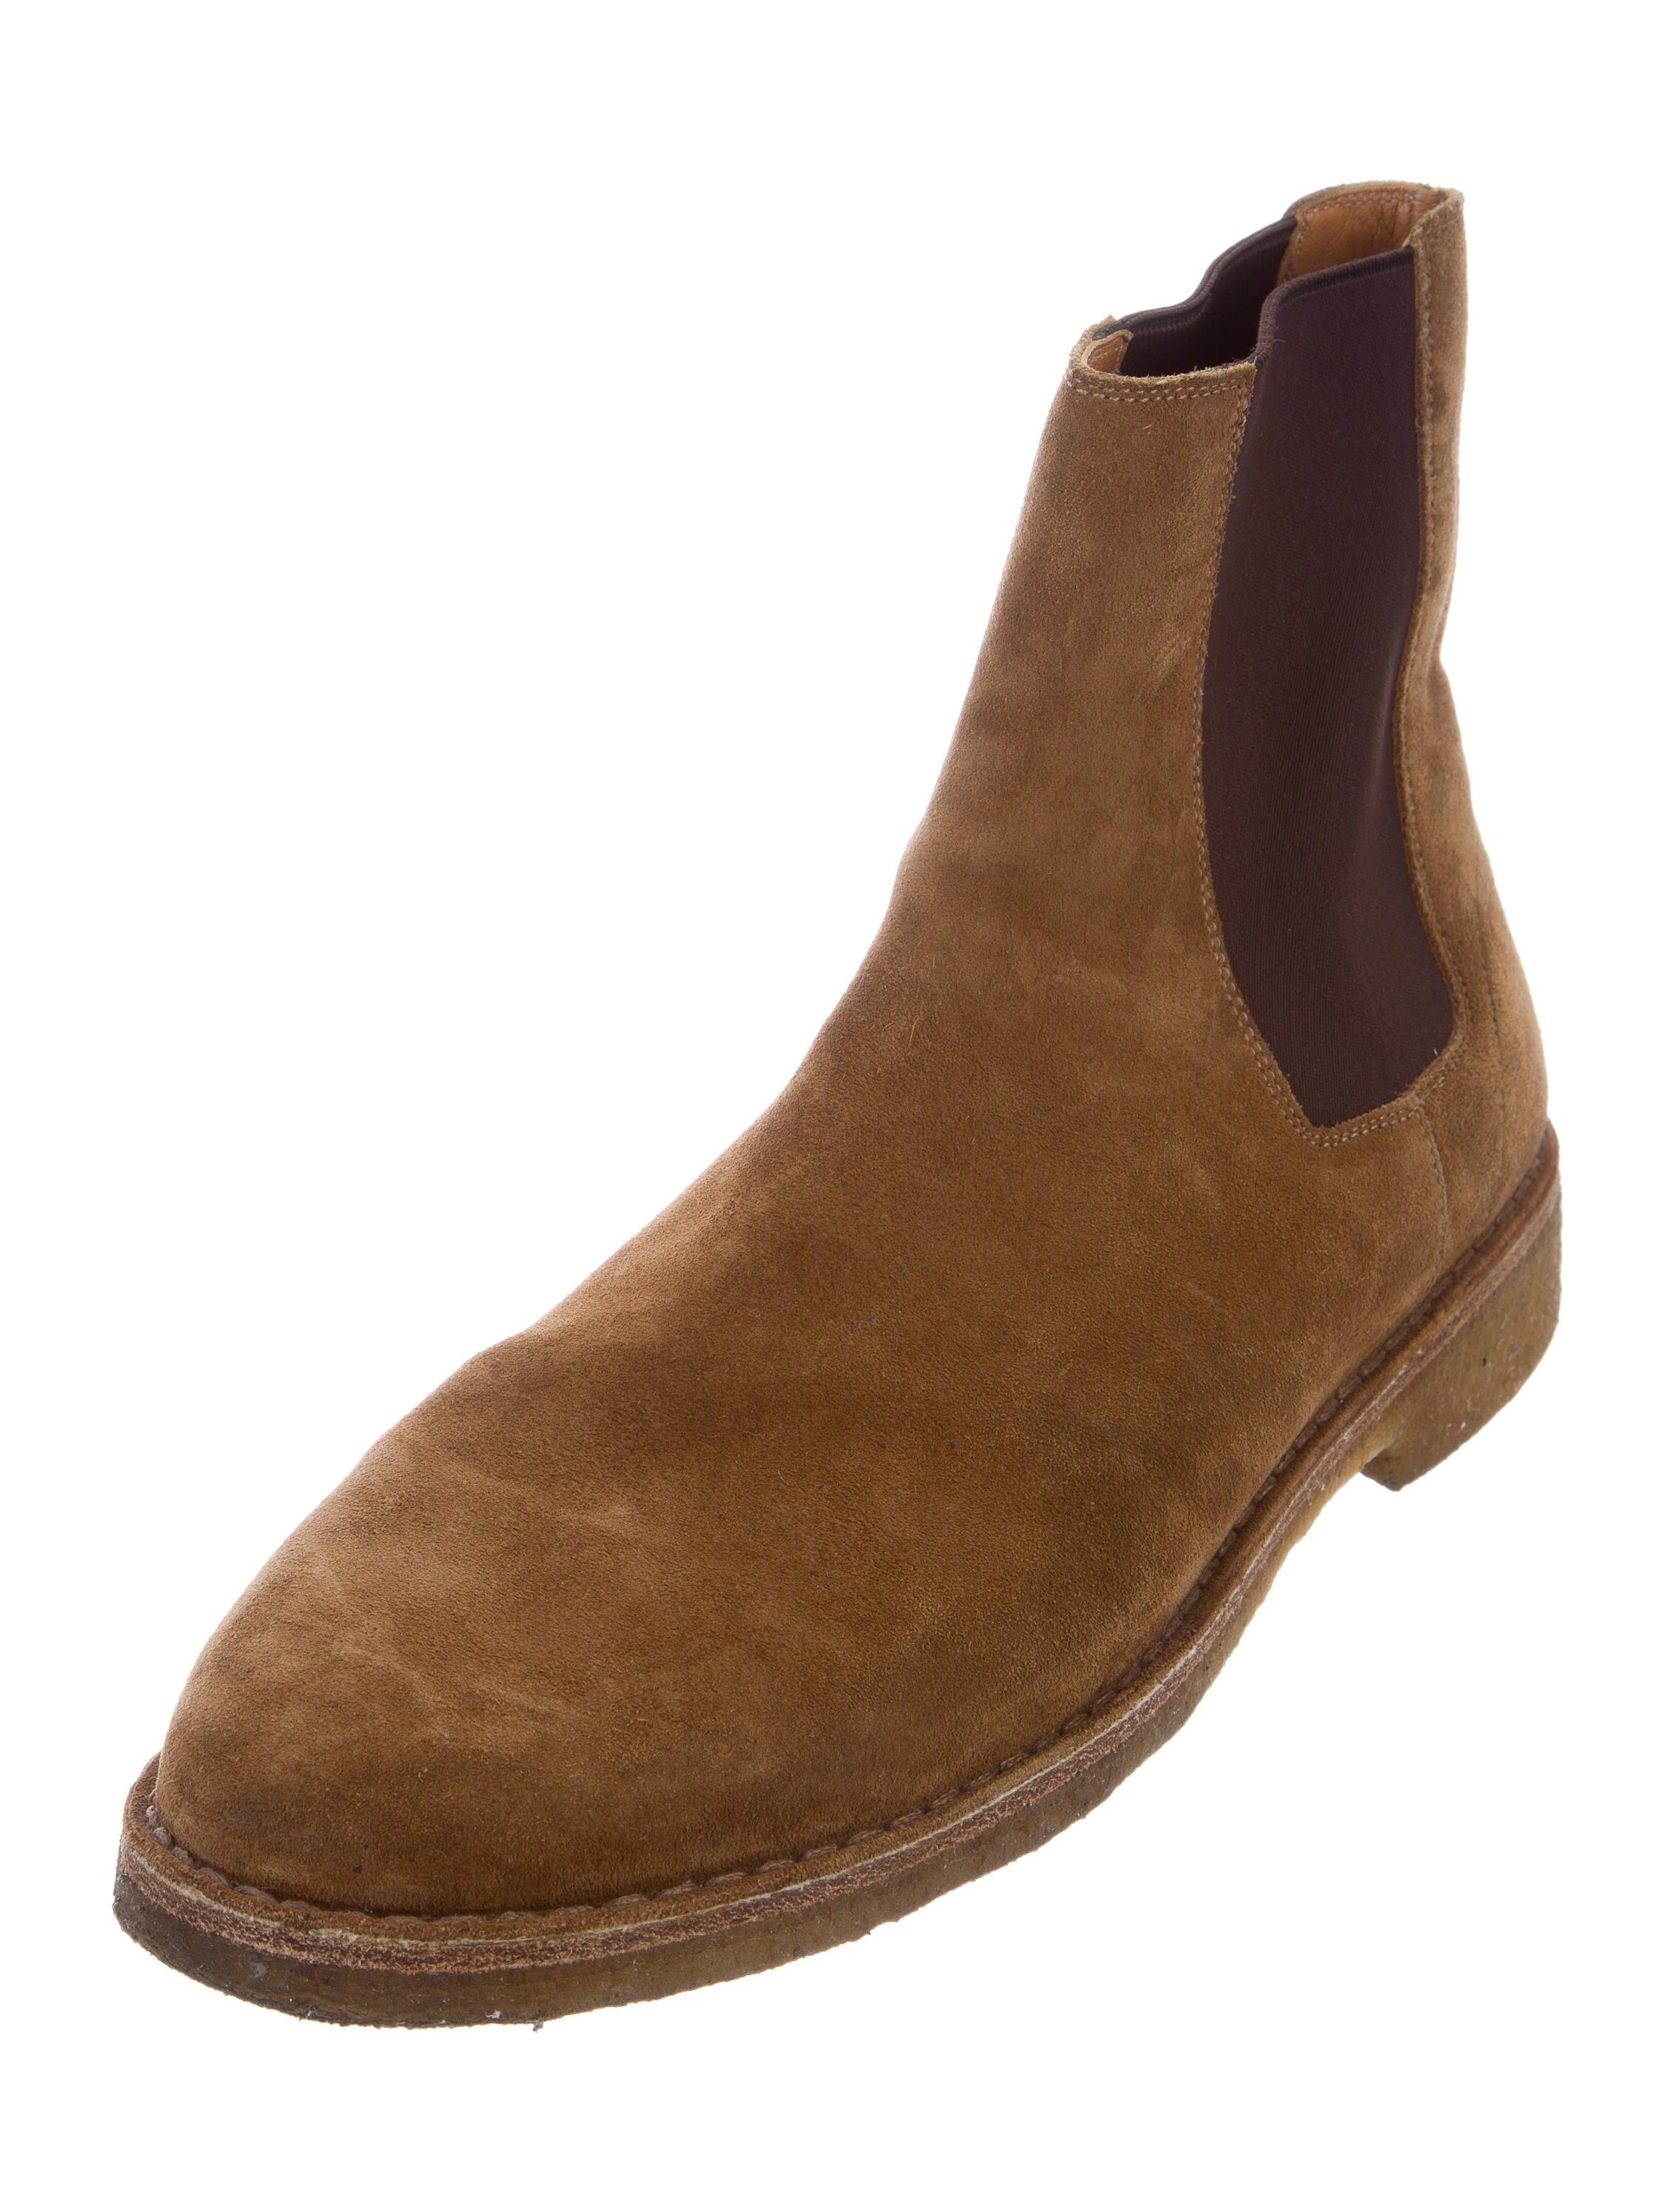 laurent suede chelsea boots shoes snt35742 the